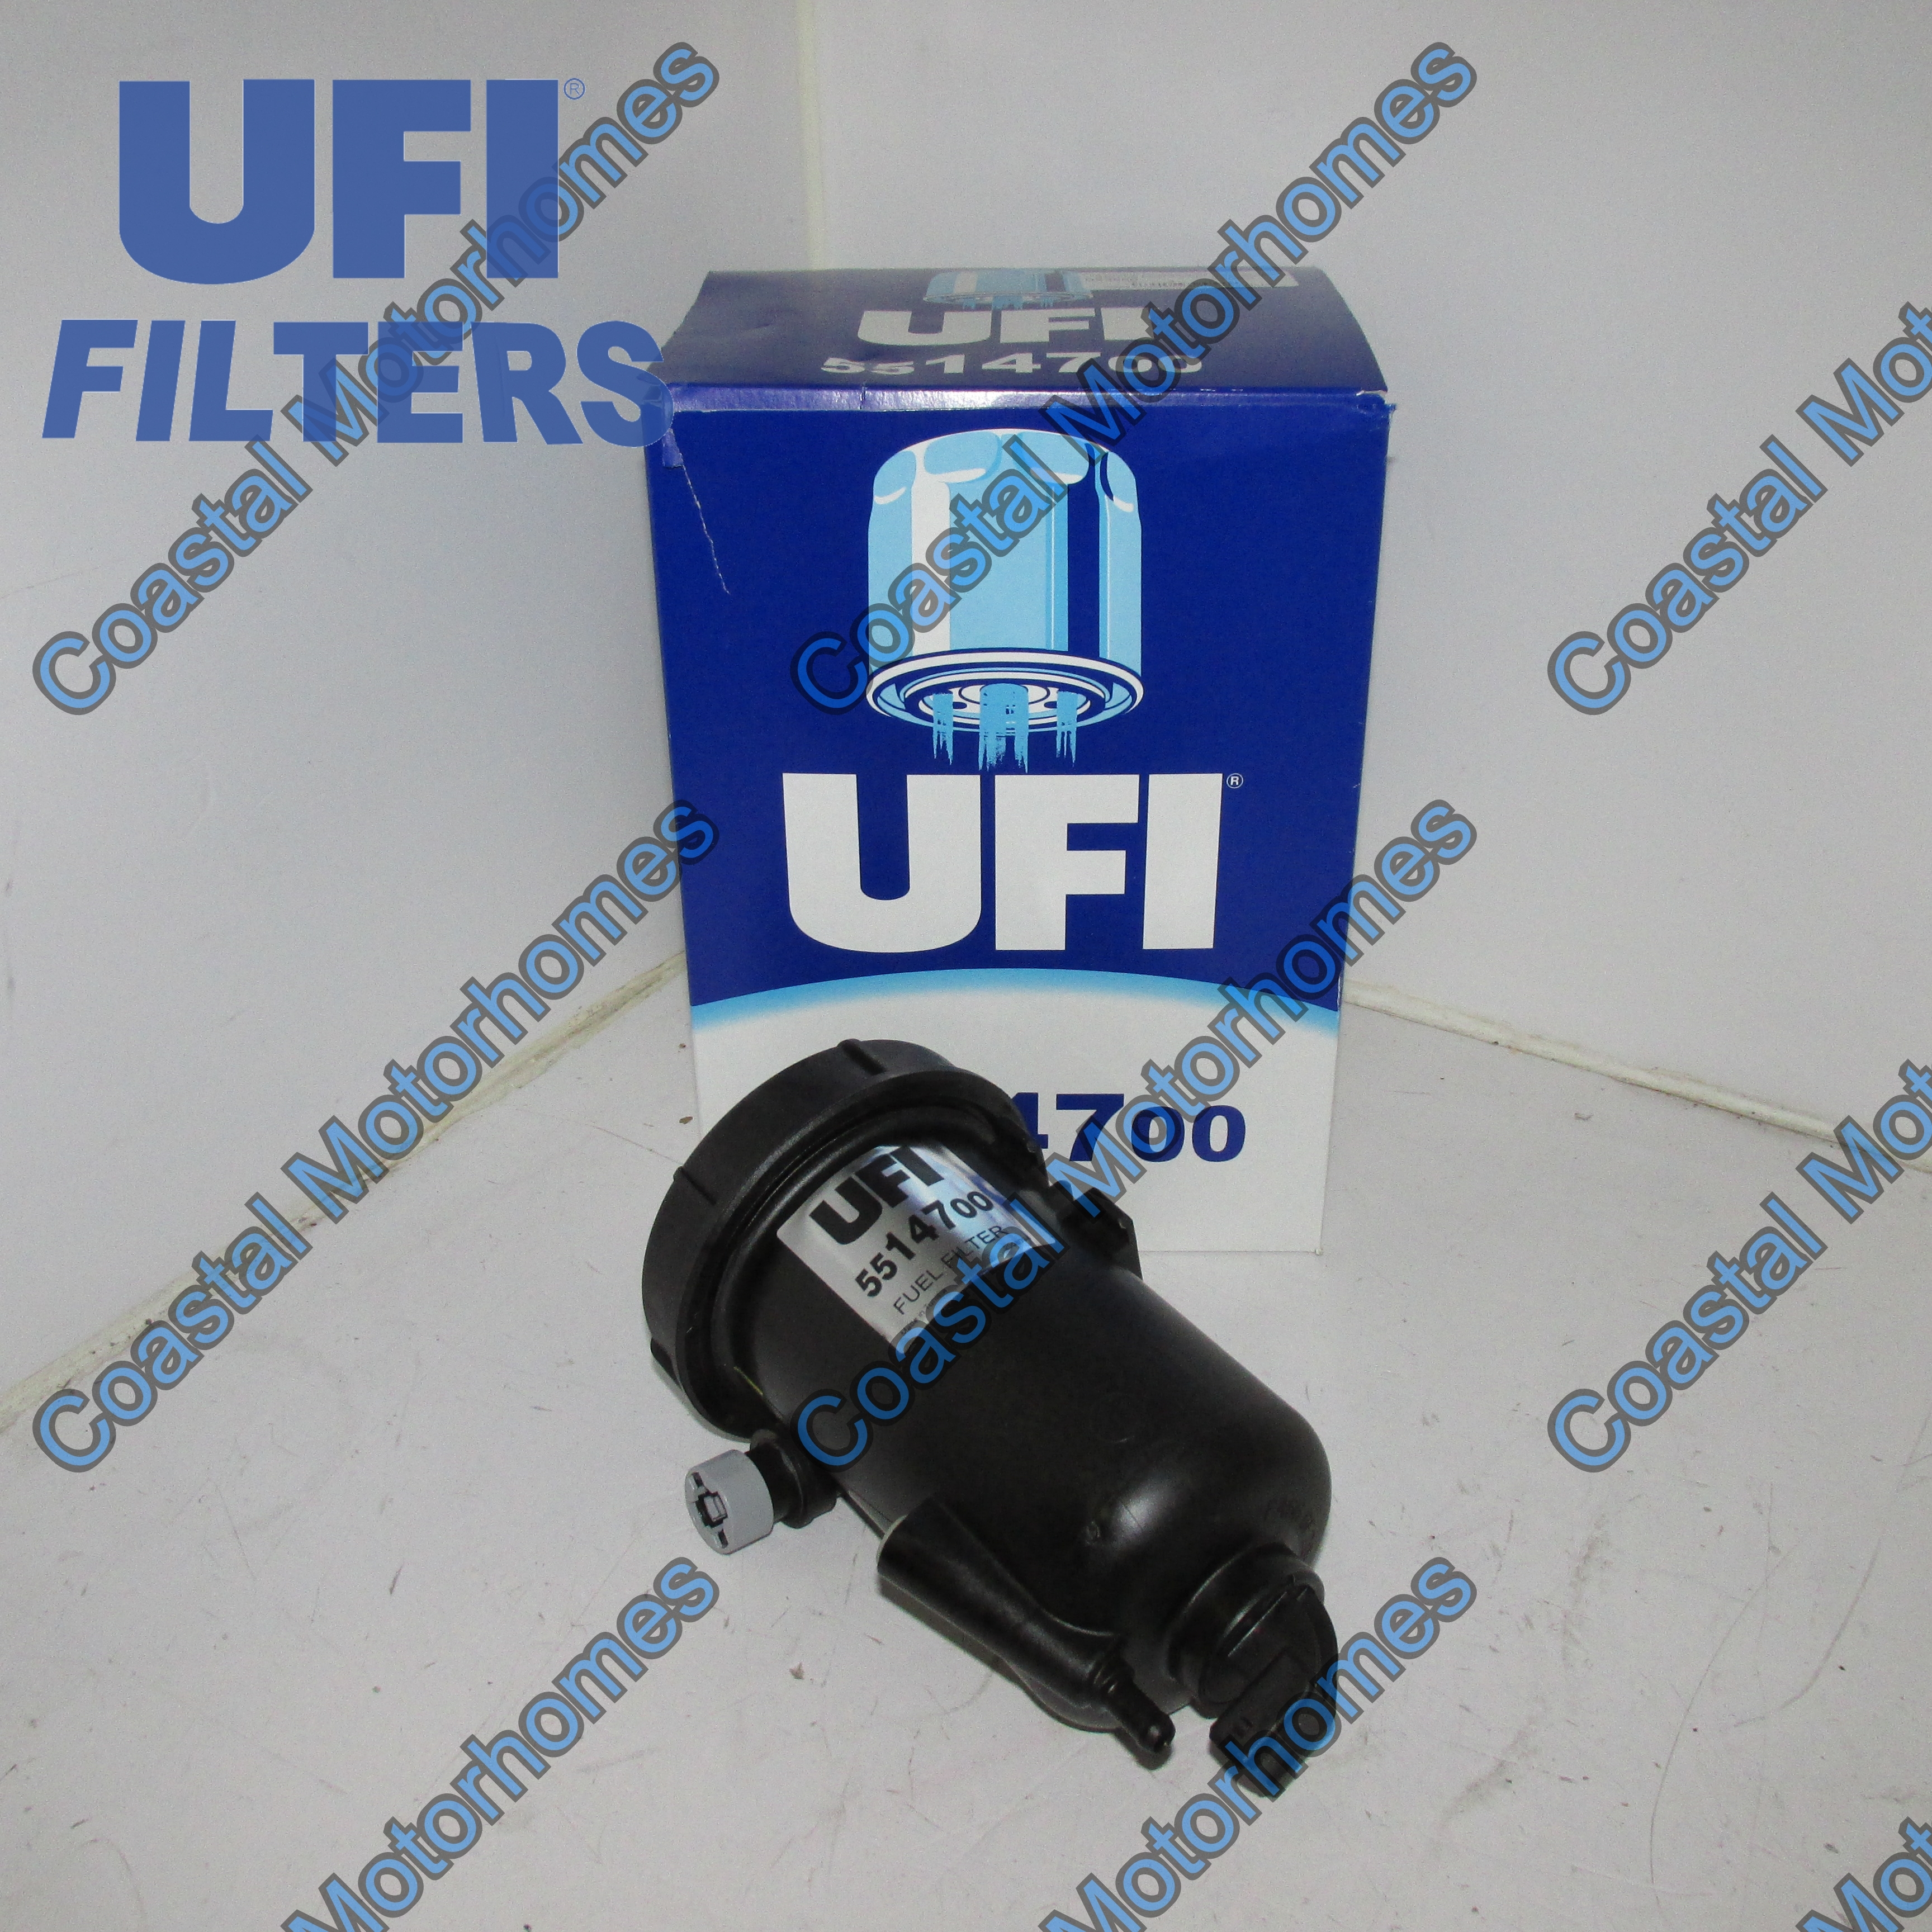 Fits Fiat Ducato 2.2 100 Multijet Genuine Borg /& Beck Fuel Filter